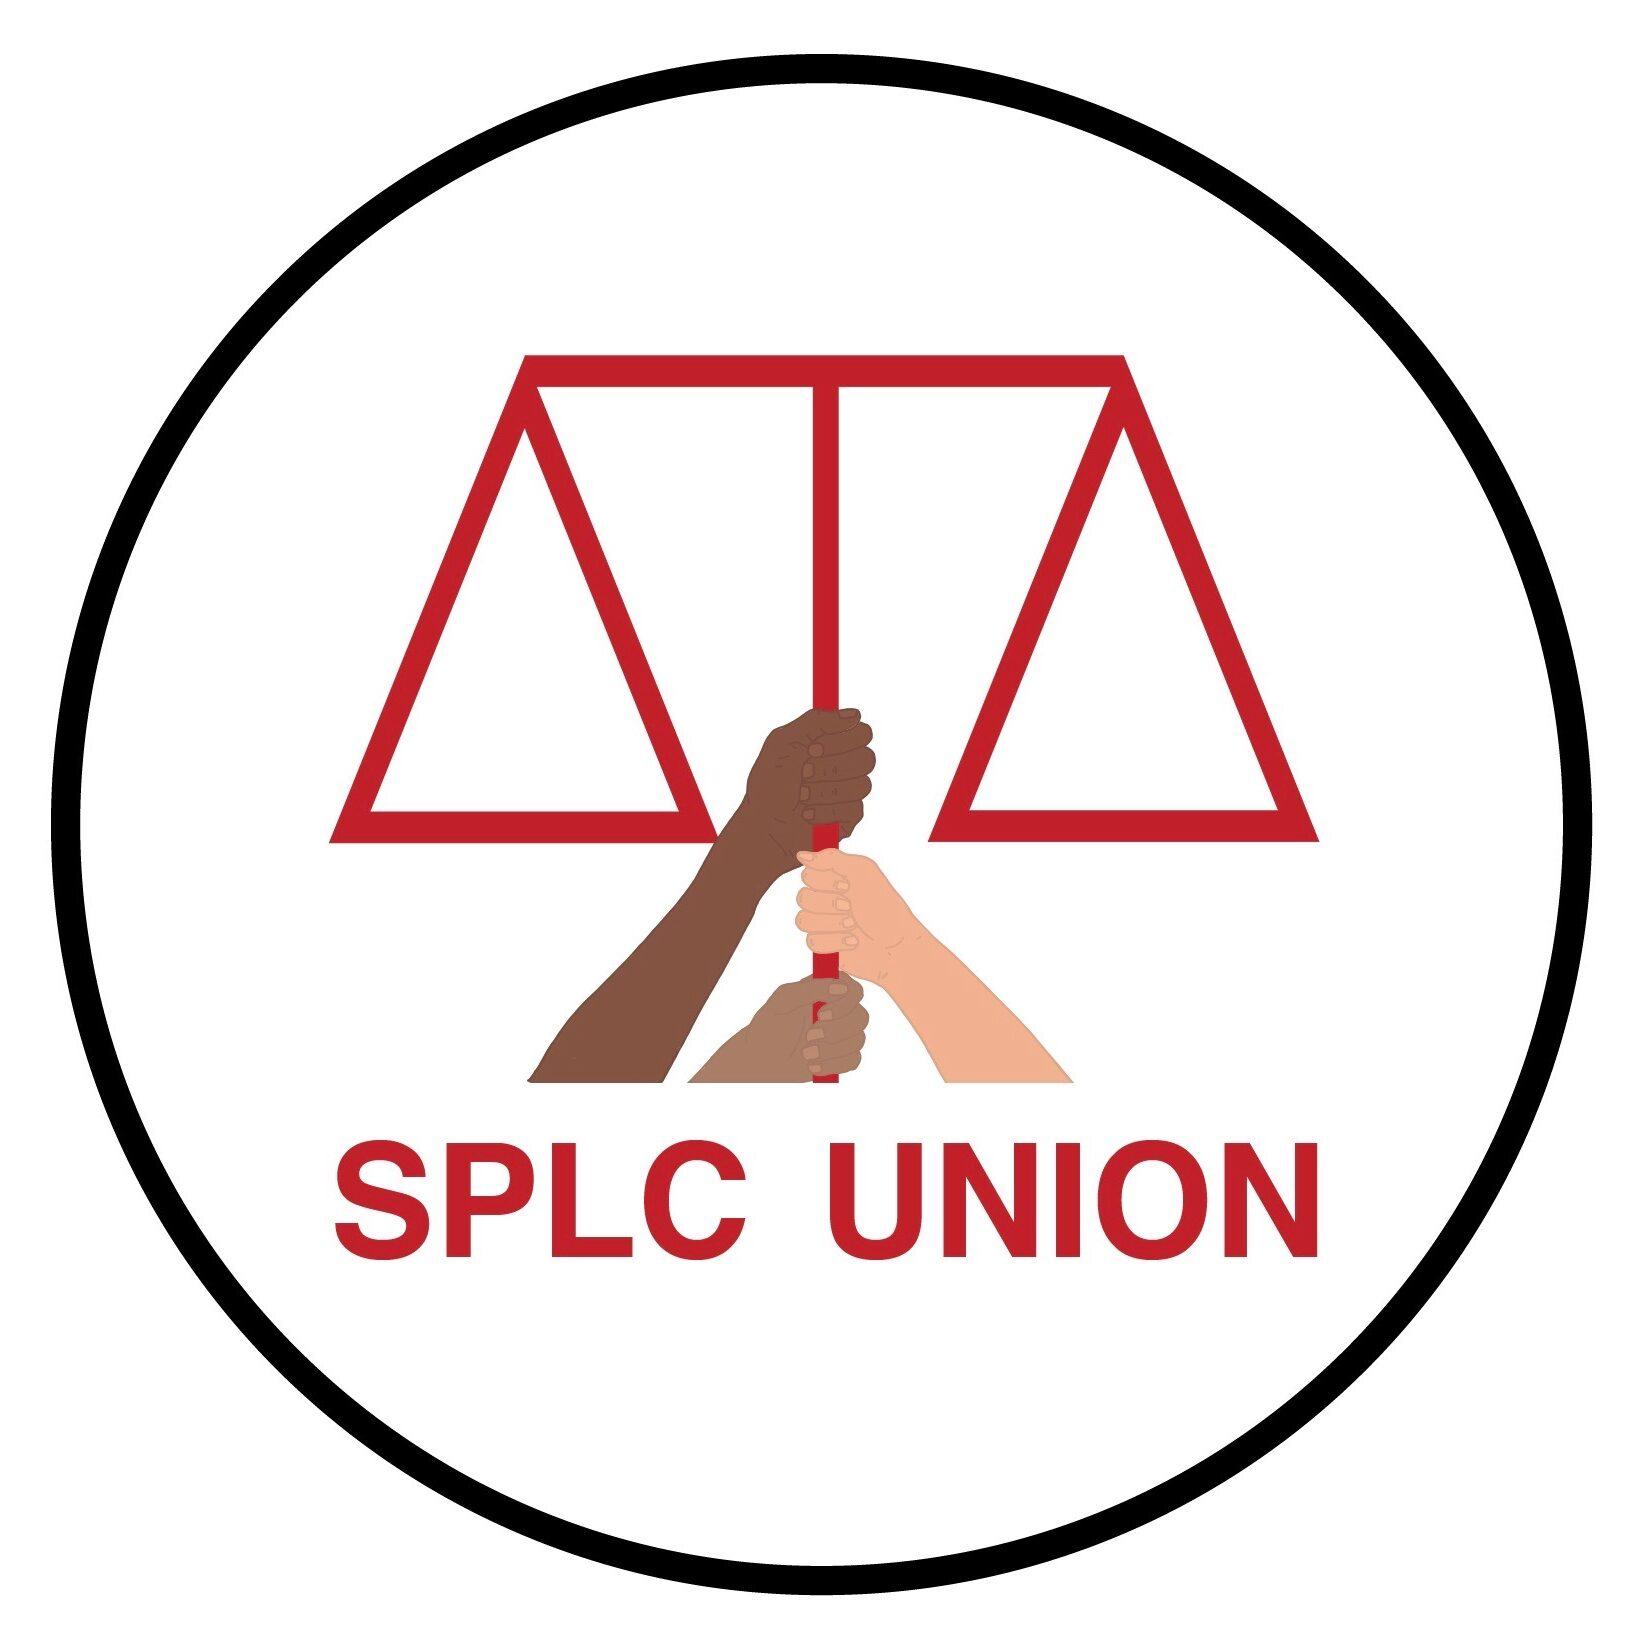 SPLC Union